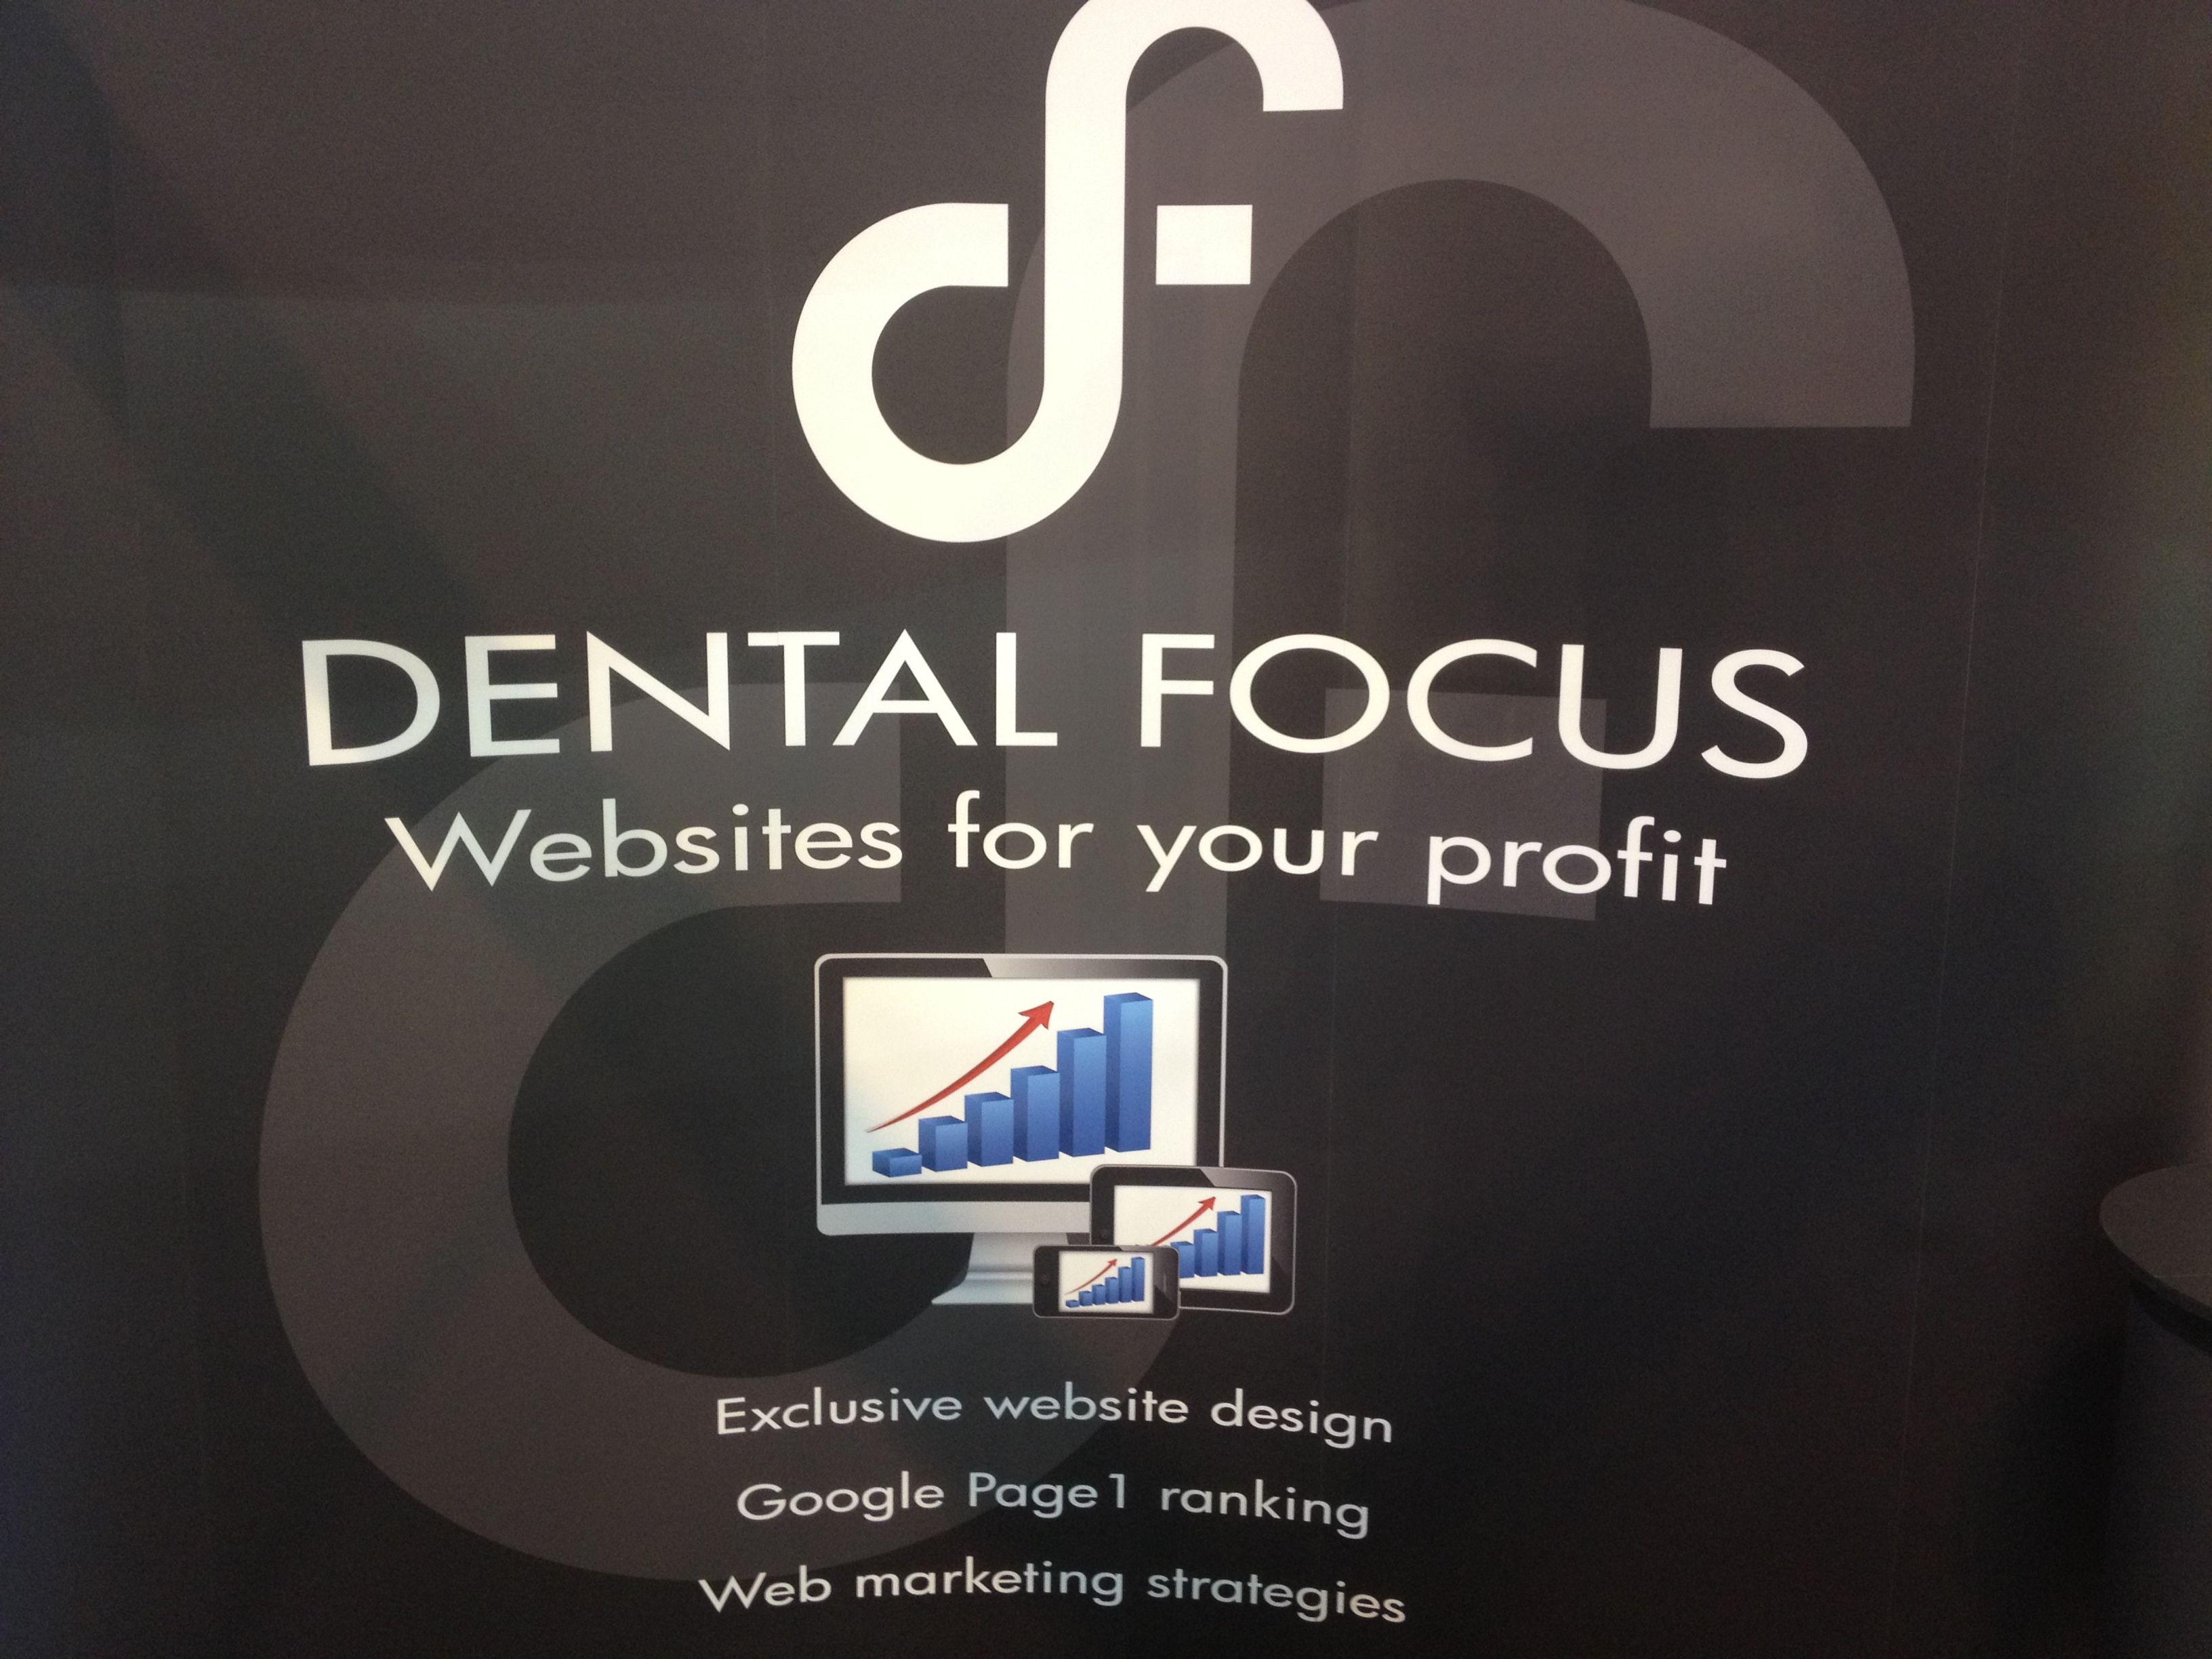 Dental Focus re-brand